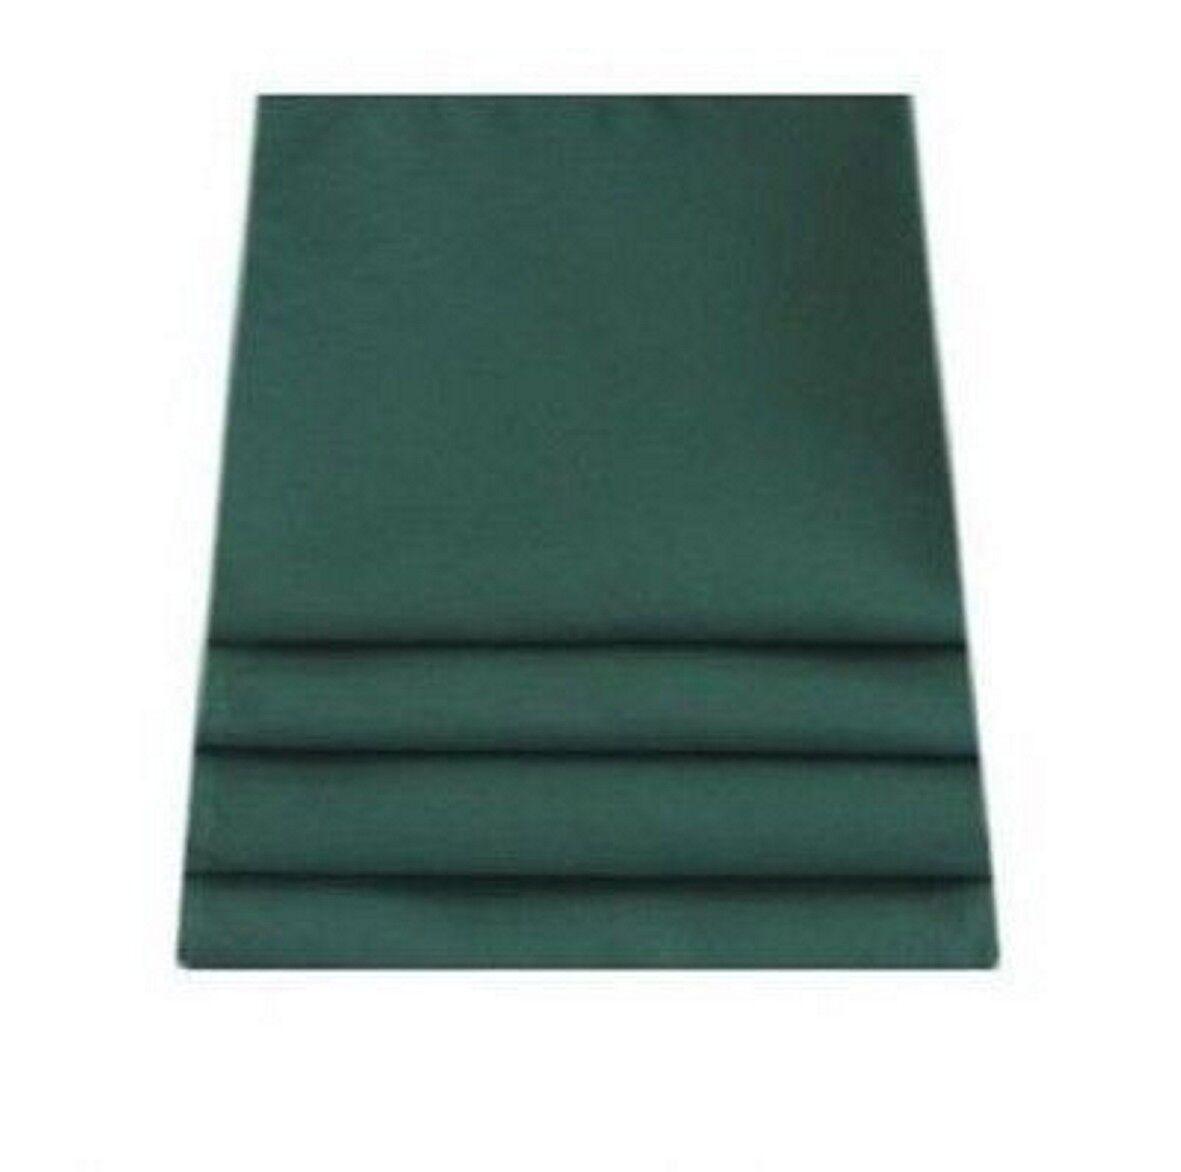 Large Forest Green Napkins - Resturant Quality 51cm Square